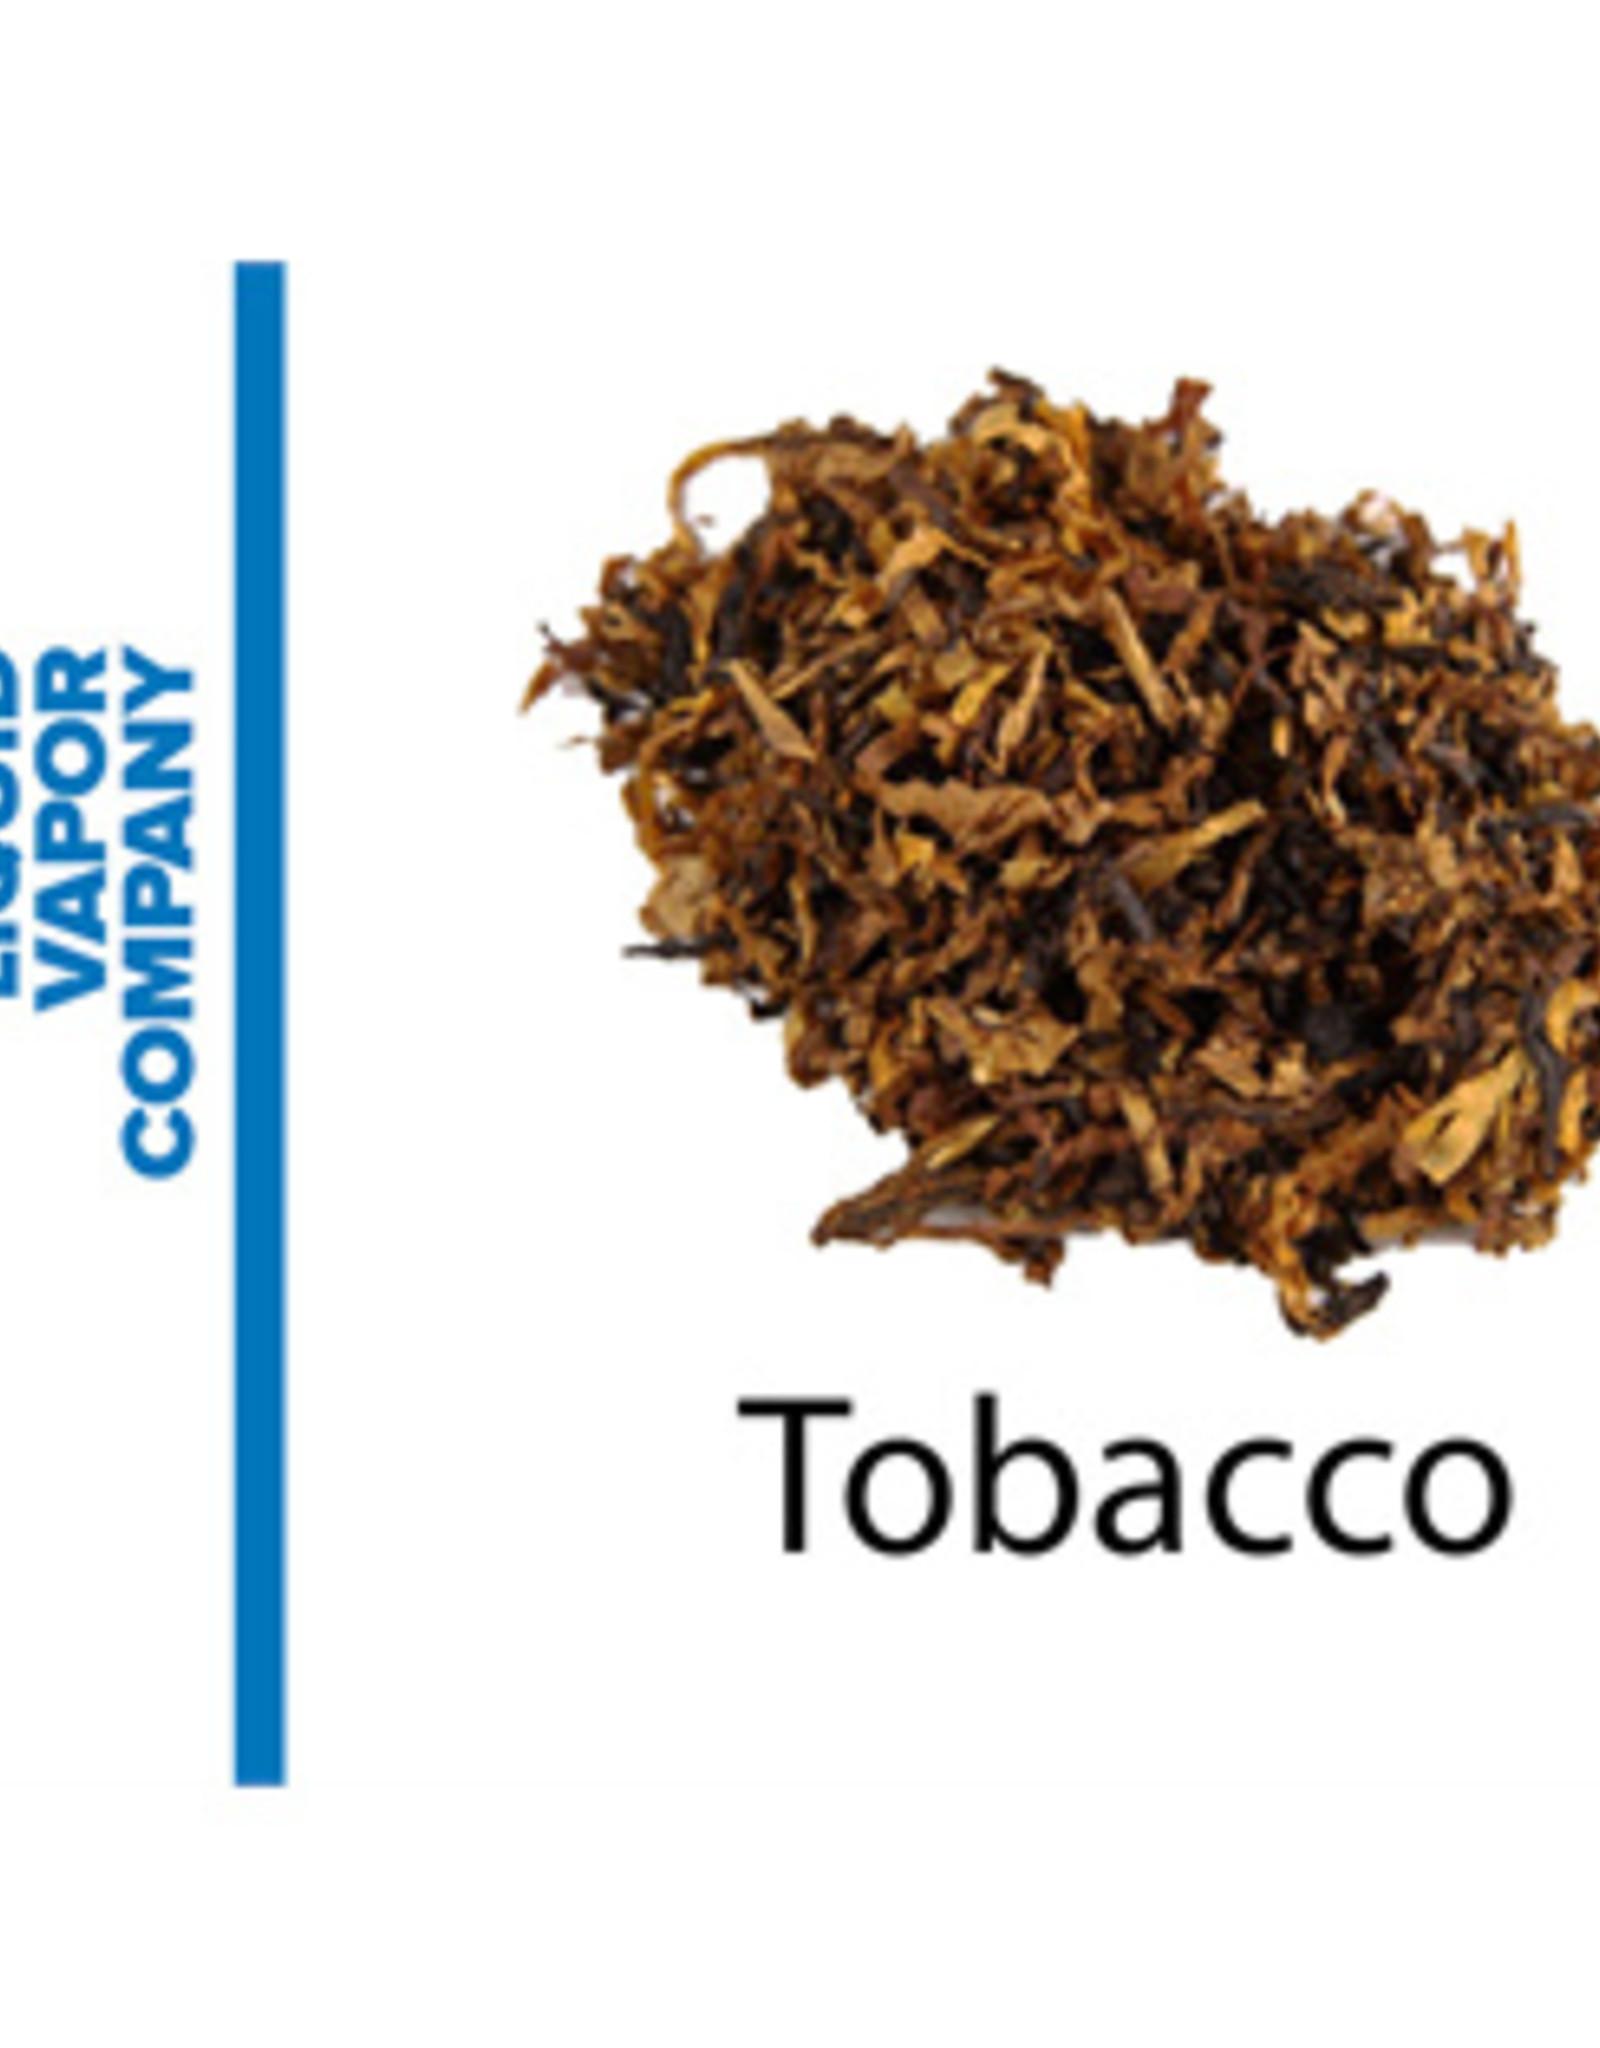 Speens Speens E-Liquid Tobacco 4 mg nicotine